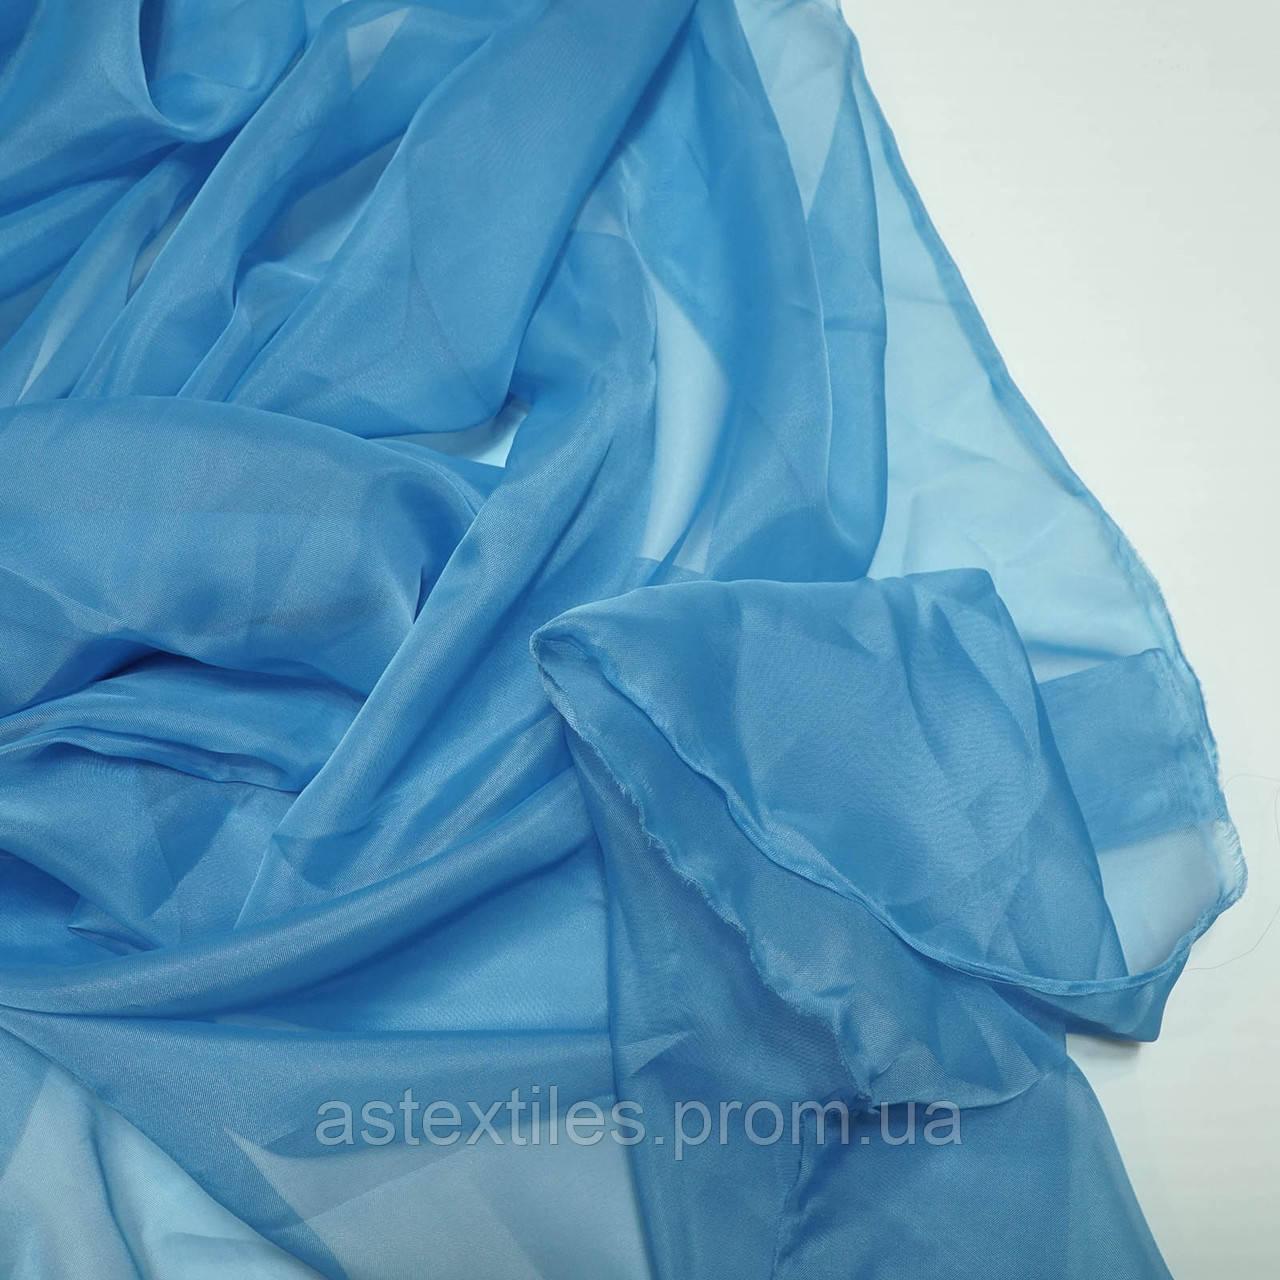 Шторний шифон, тюль (блакитний)